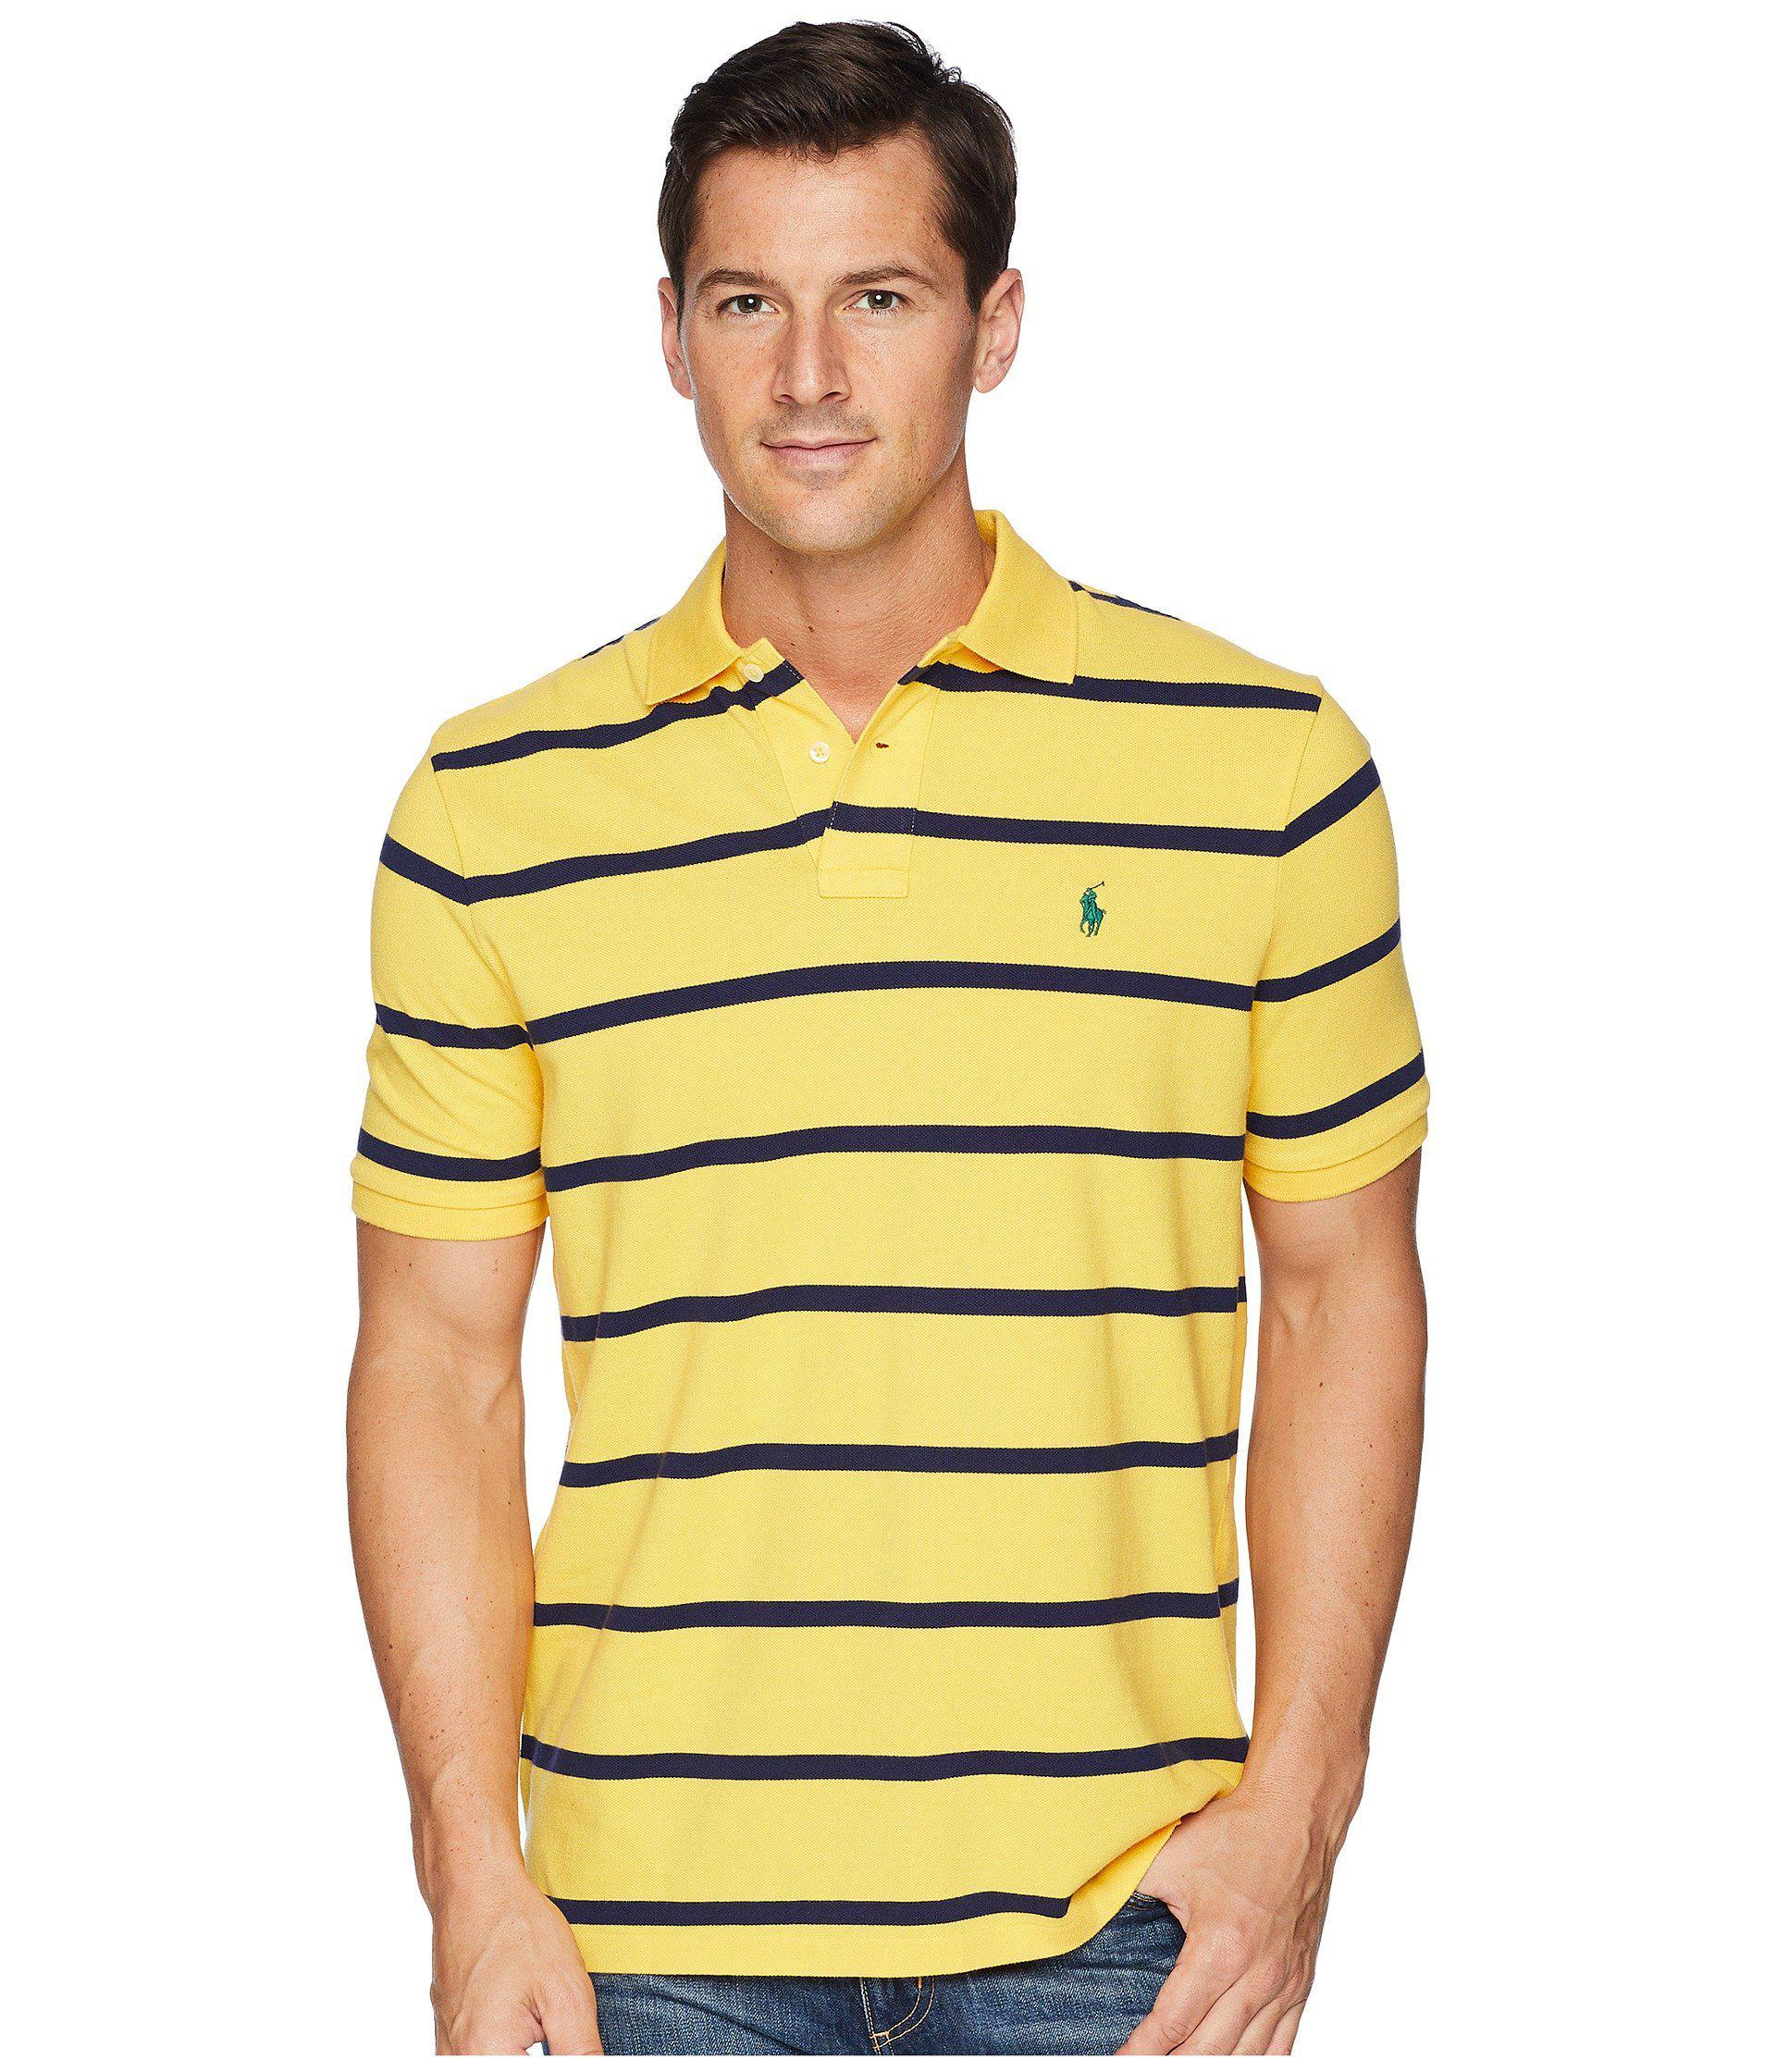 Lyst - Polo Ralph Lauren Yarn-dyed Mesh Short Sleeve Knit in Yellow ... 366d74960038